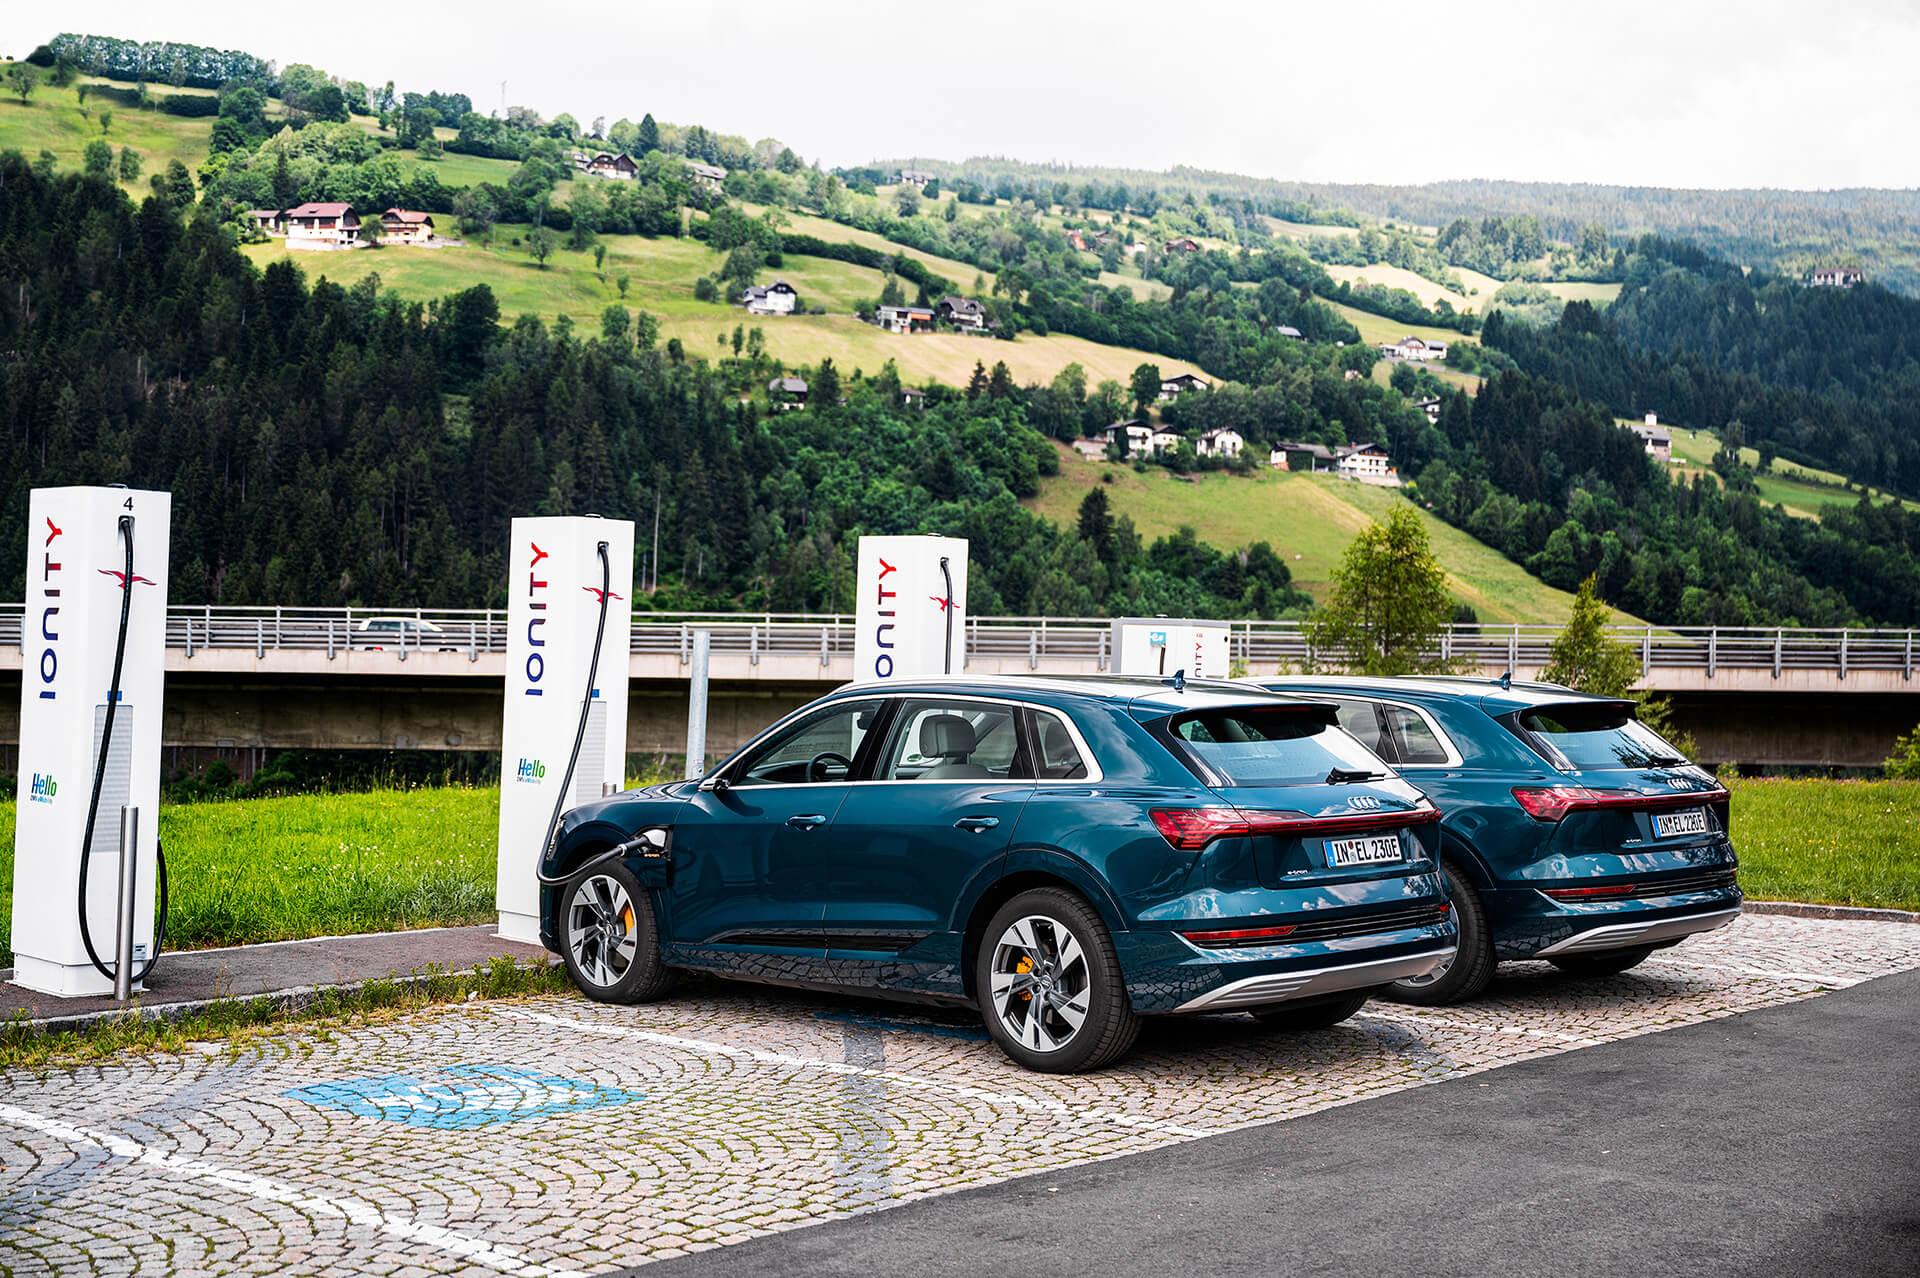 Audi e-tron σε σταθμούς φόρτισης